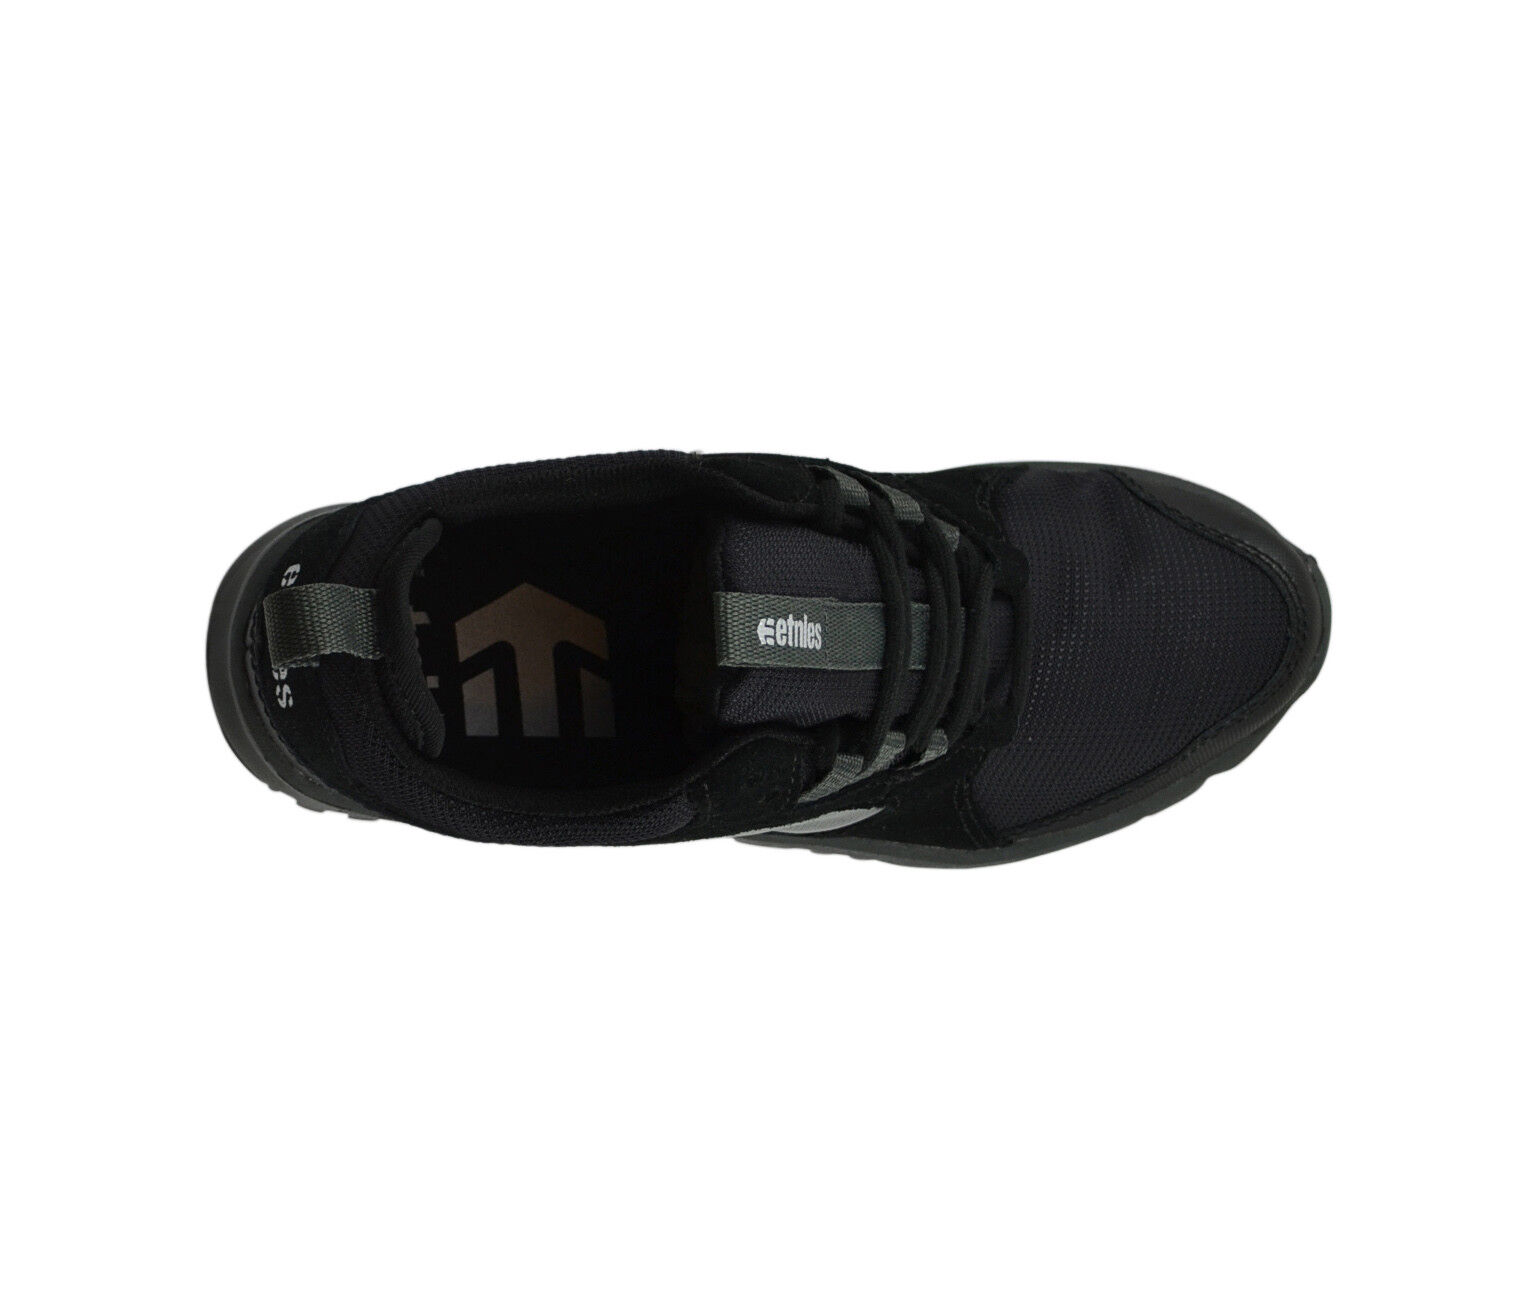 Etnies Etnies Etnies Scout MT schwarz dark grau Skater Turnschuhe Schuhe schwarz f386a6